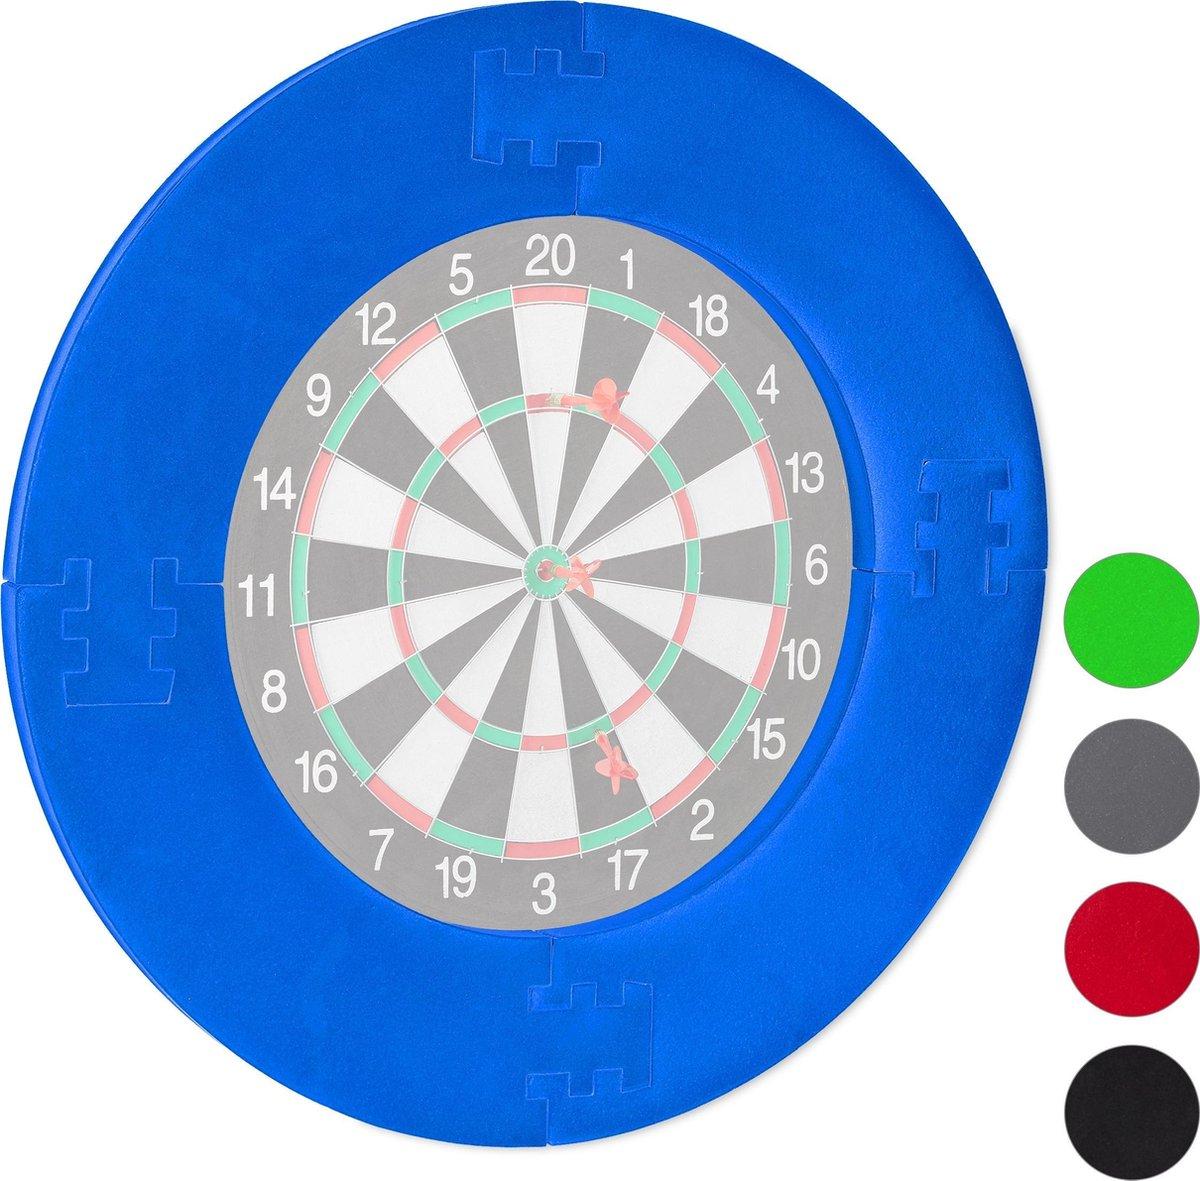 relaxdays dartbord surround ring - beschermring - bescherming voor muur - beschermrand blauw